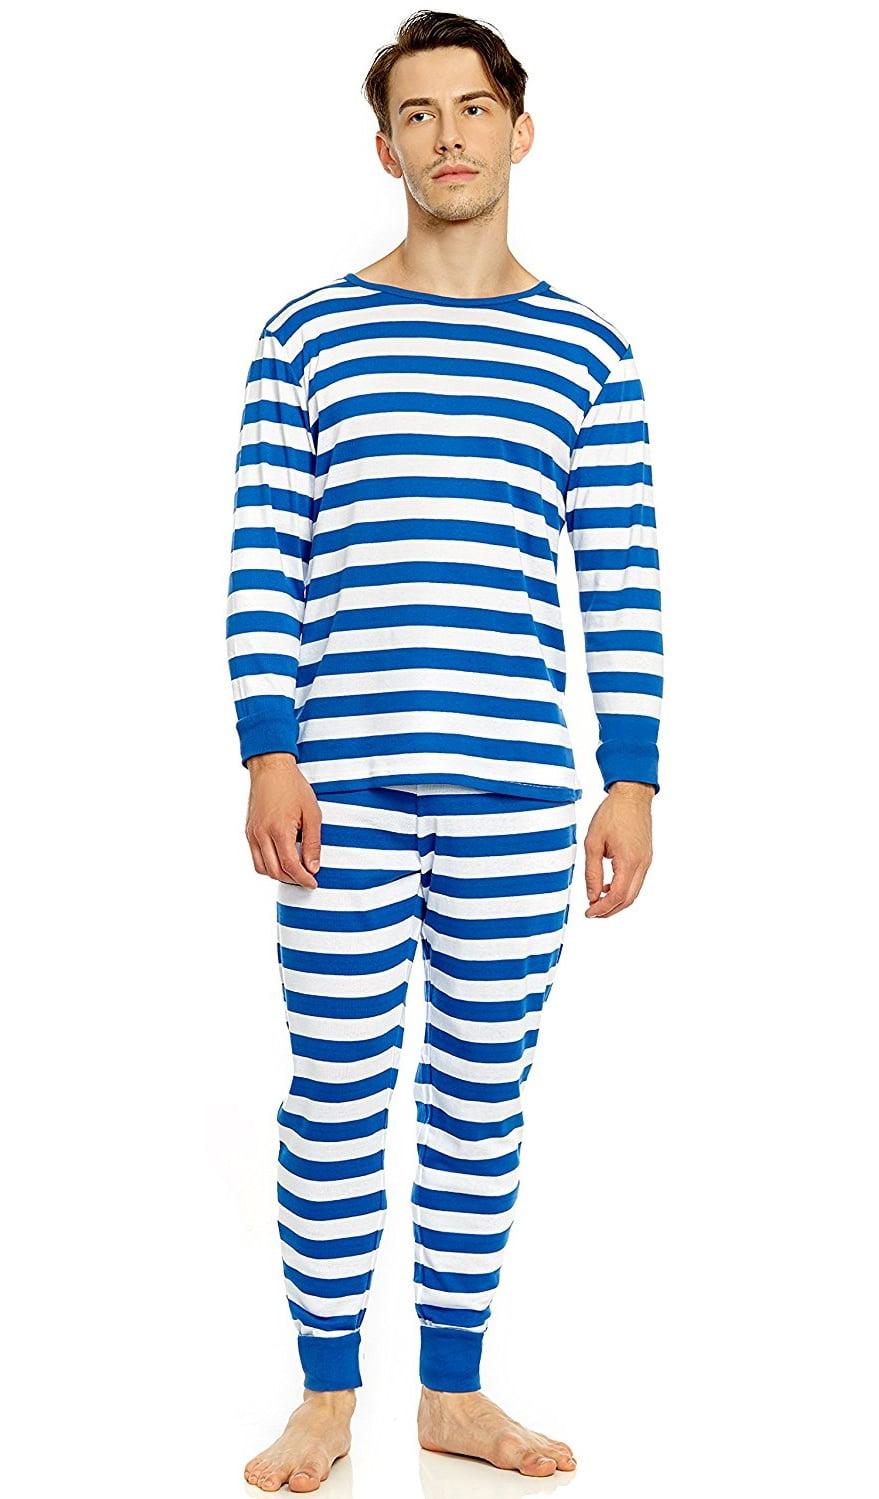 Leveret Men/'s Apple Fitted Pajama Set 100/% Organic Cotton Size XS-XL